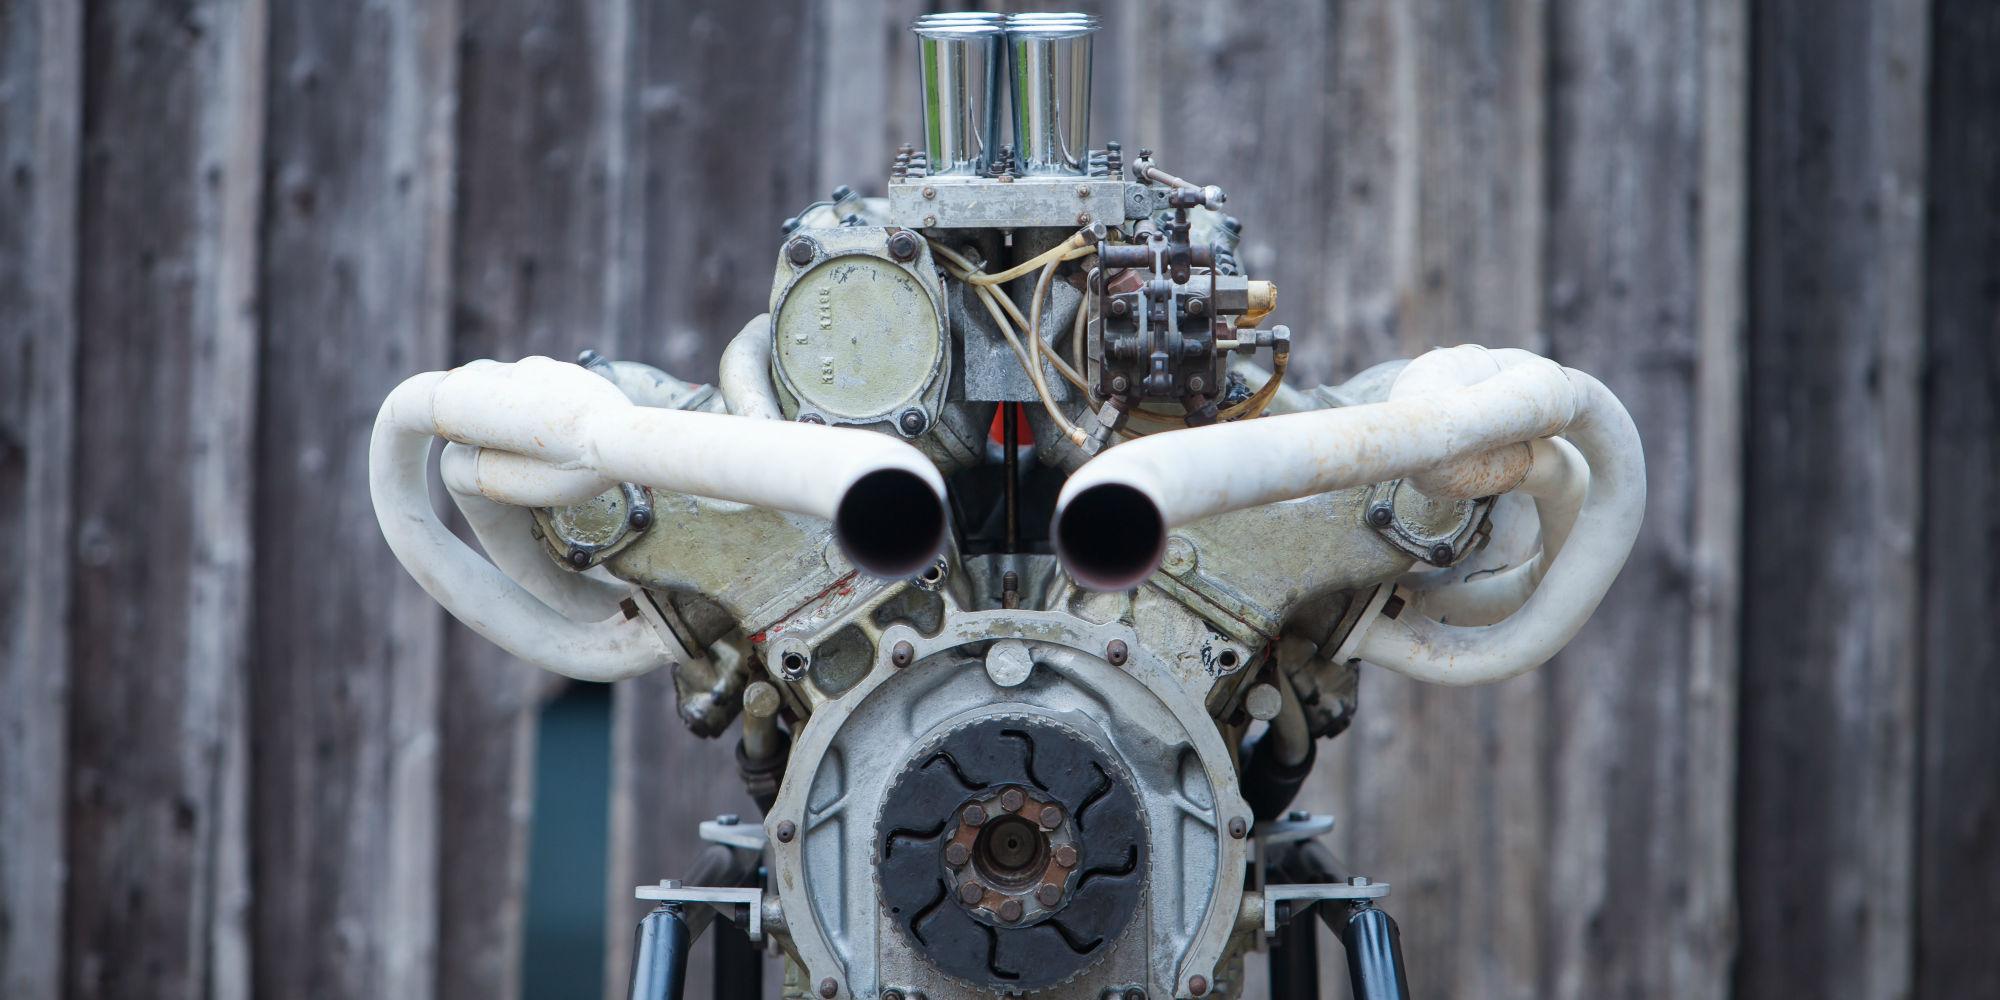 1966 Ferrari 228 Formula 1 Engine